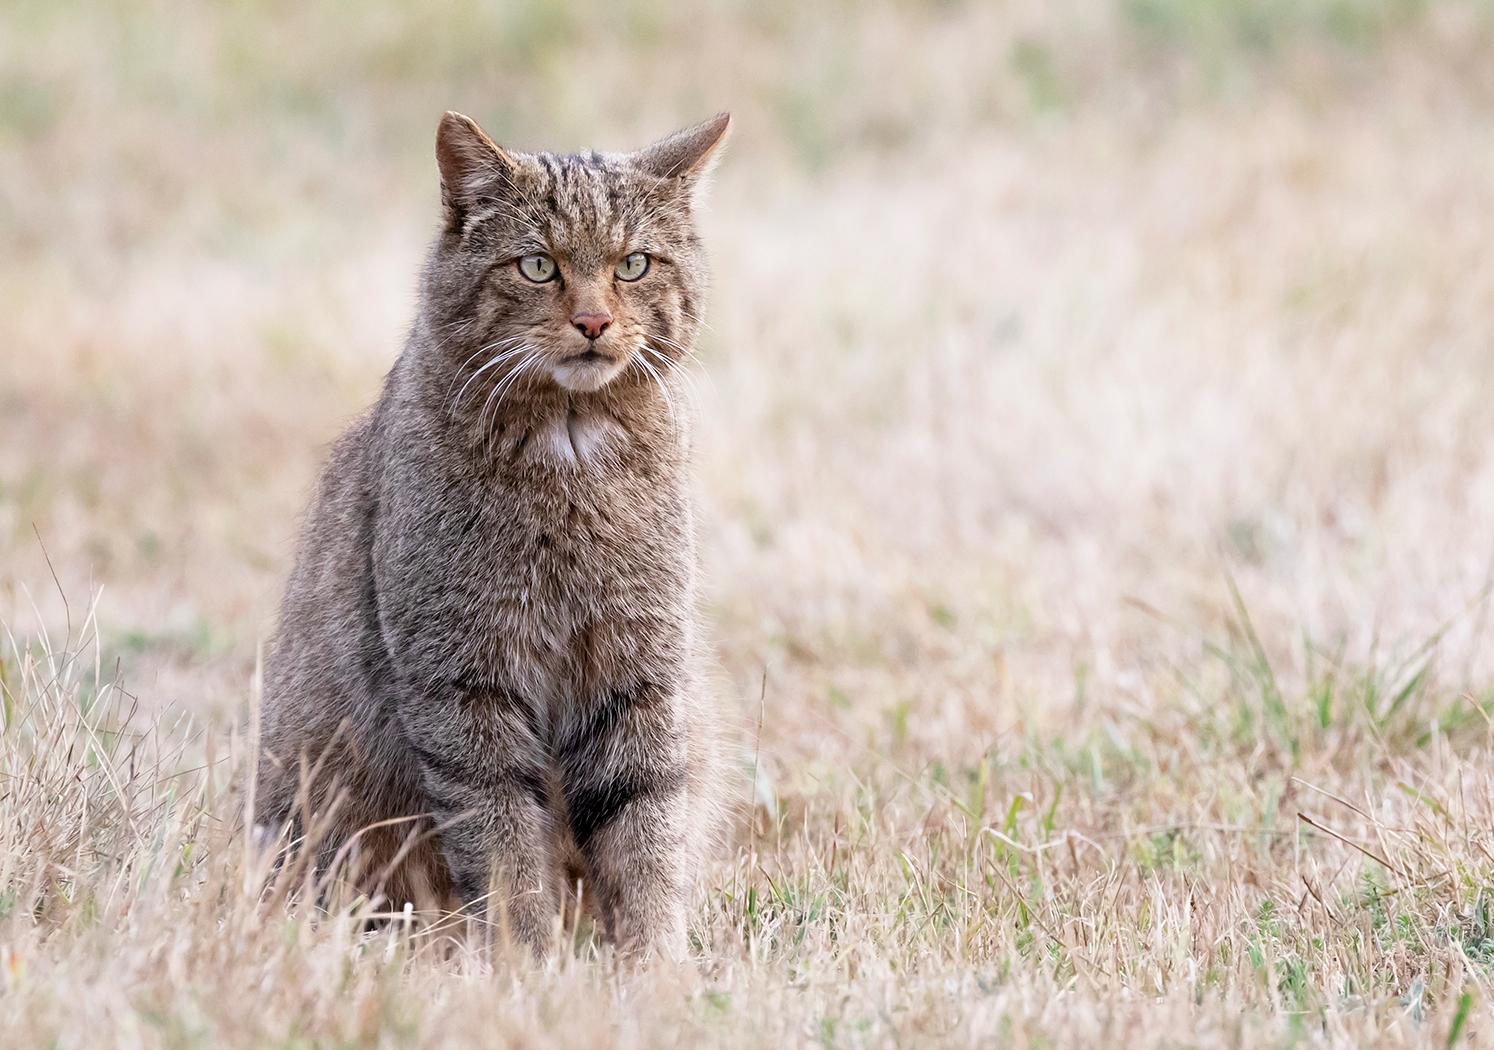 Gato montes sentado 2